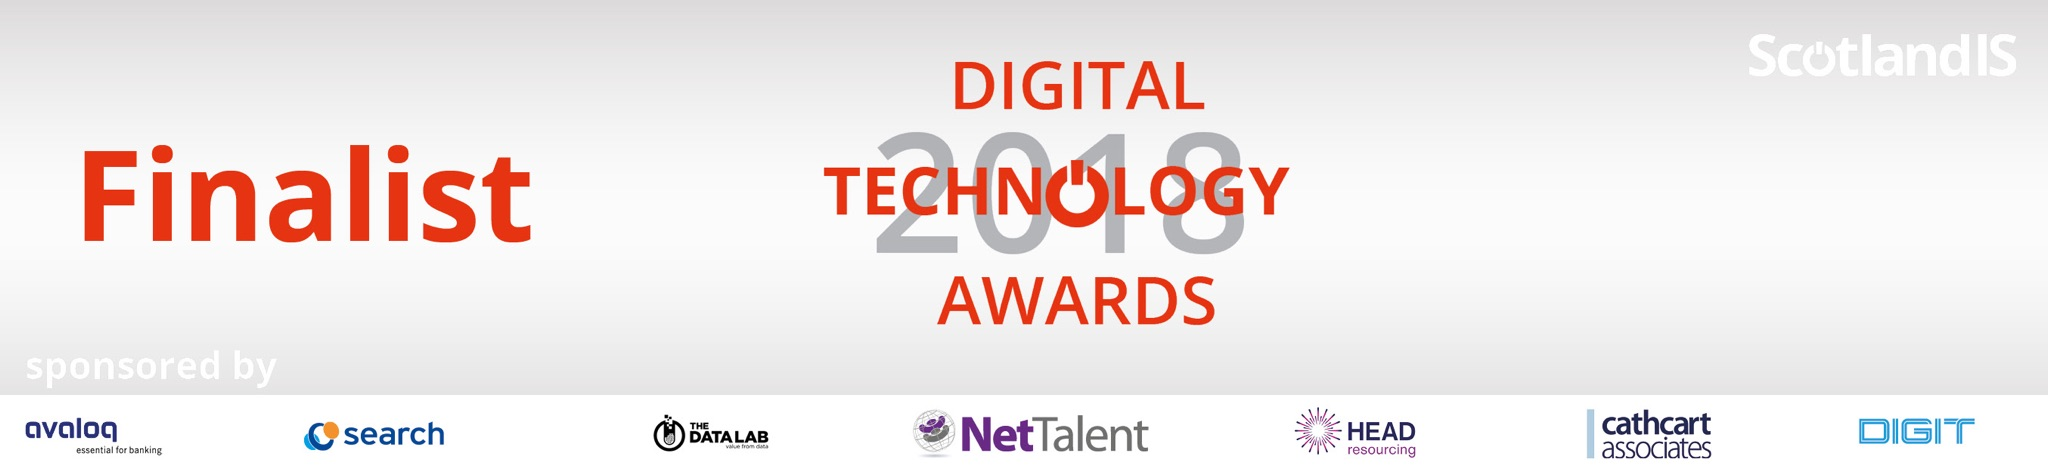 Digital Technology Awards, Finalist, Best B2B Product, Awards